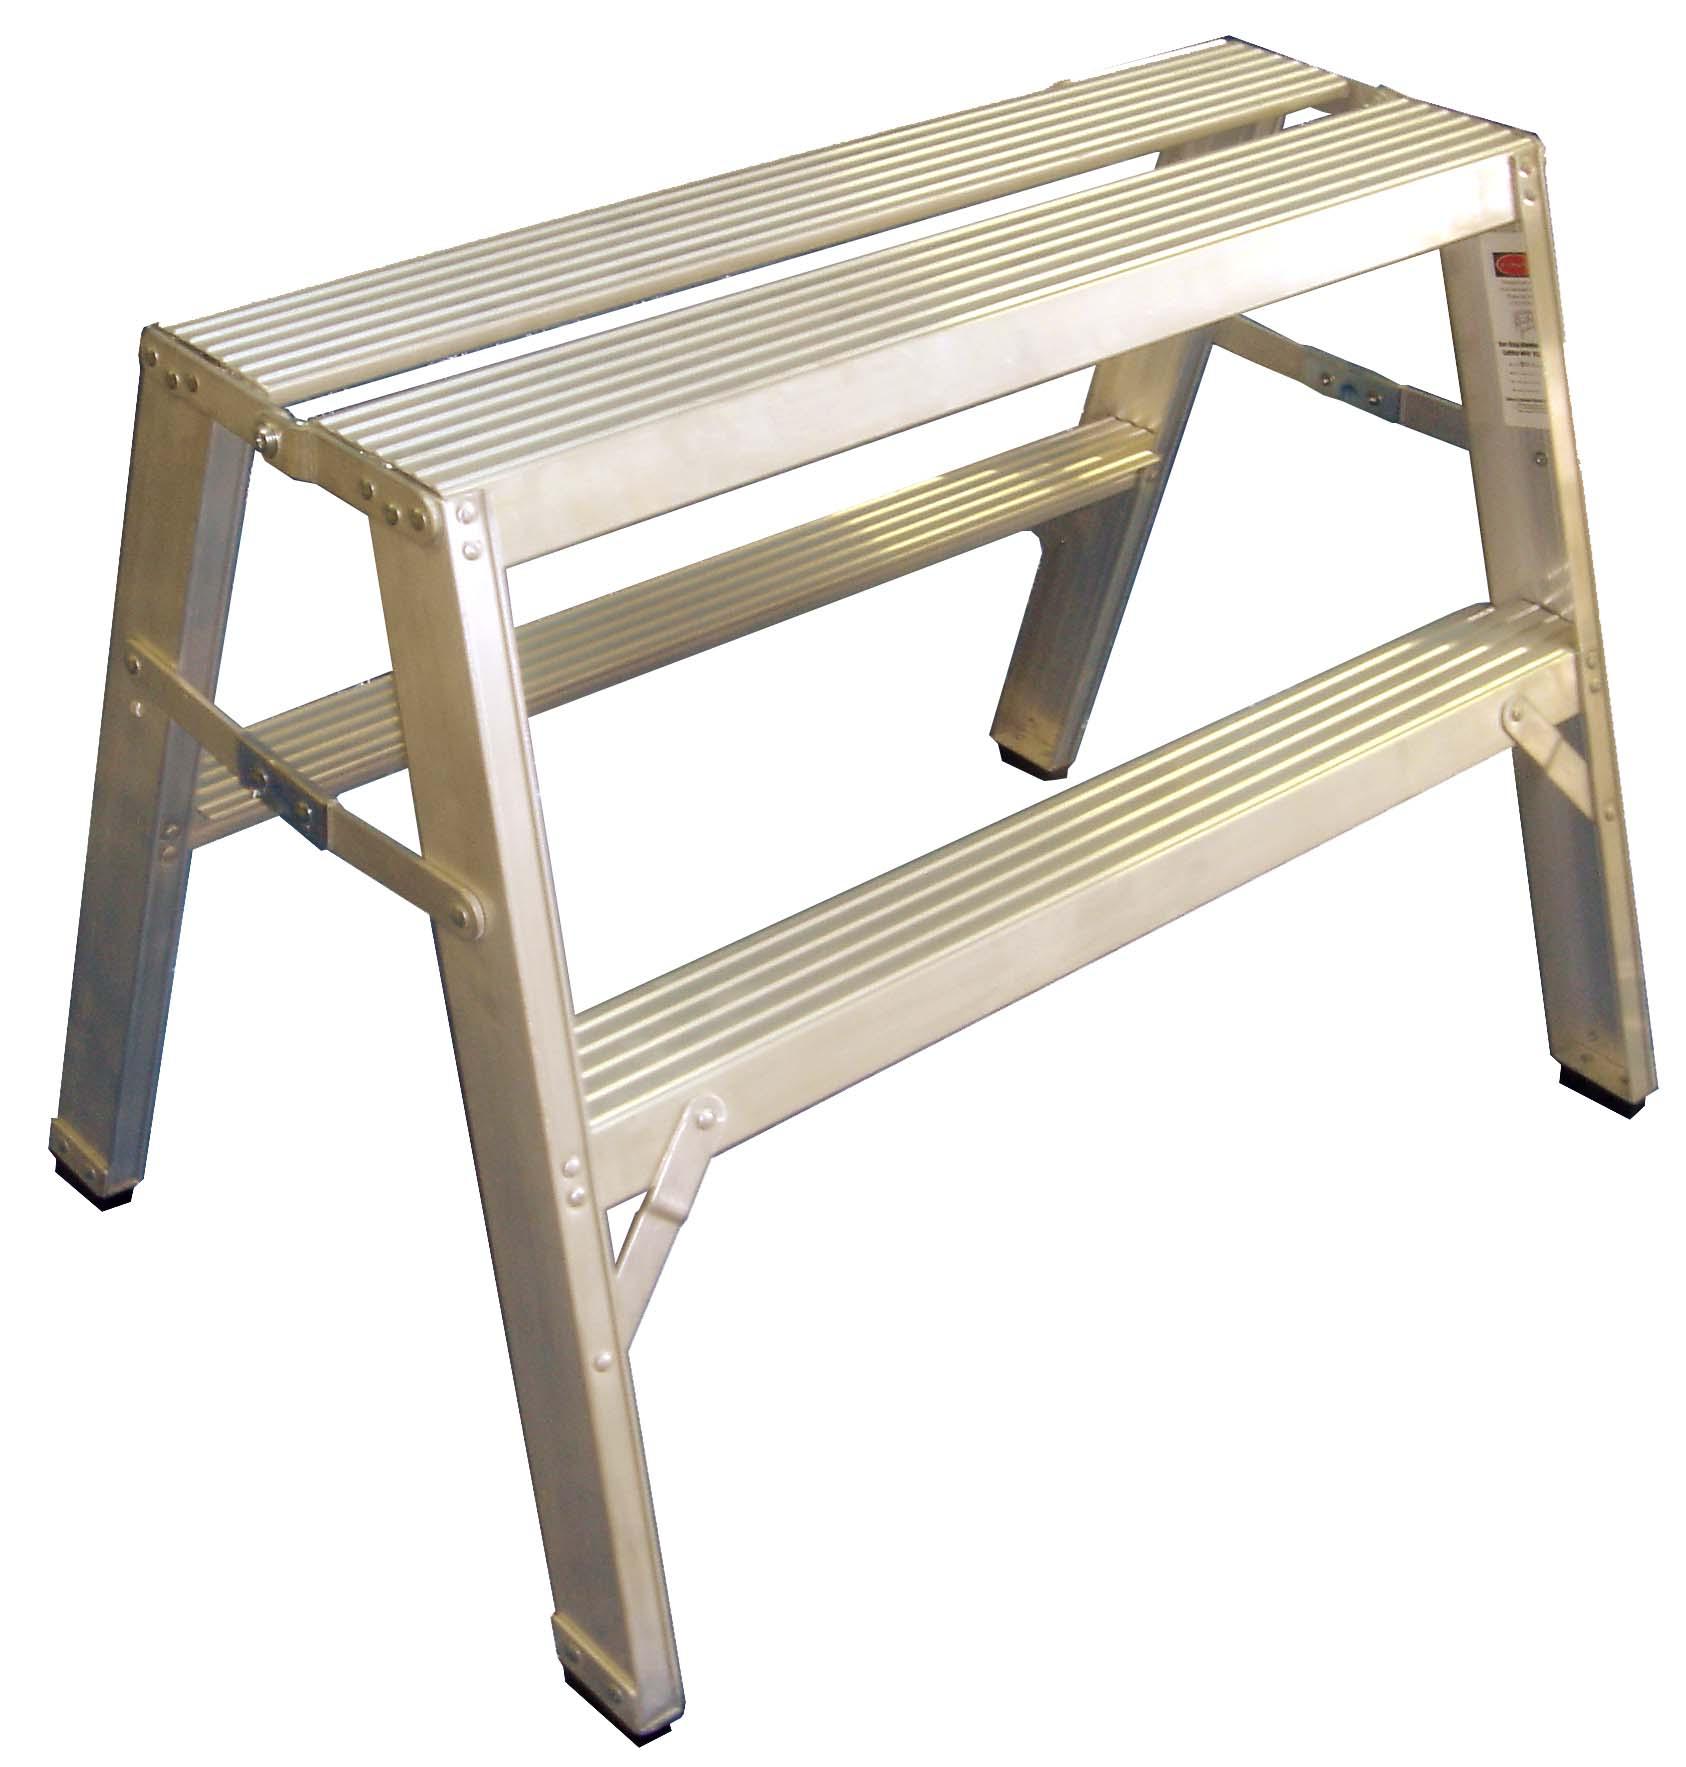 2' aluminium trigger bench